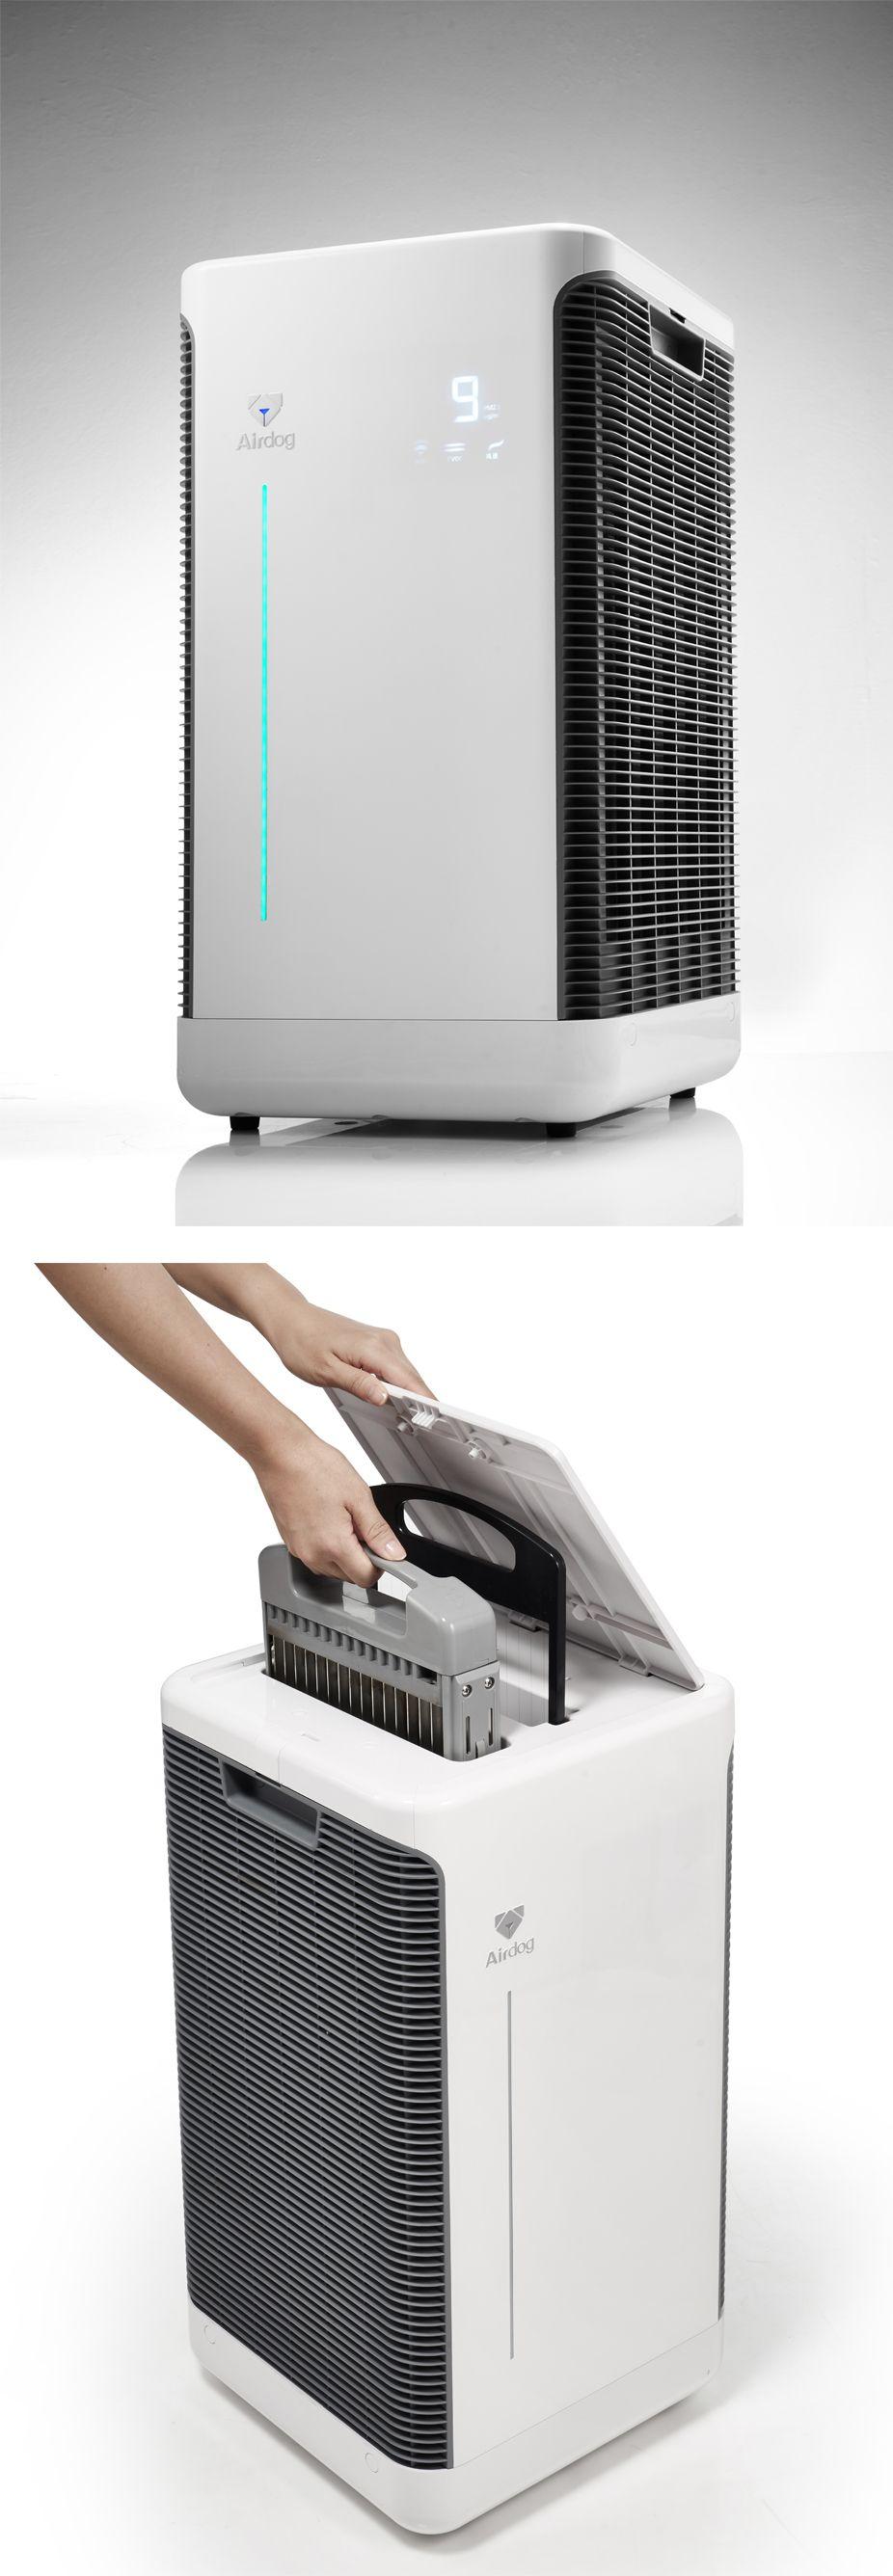 Pin by Yi Wen Chang on goth design Air purifier design